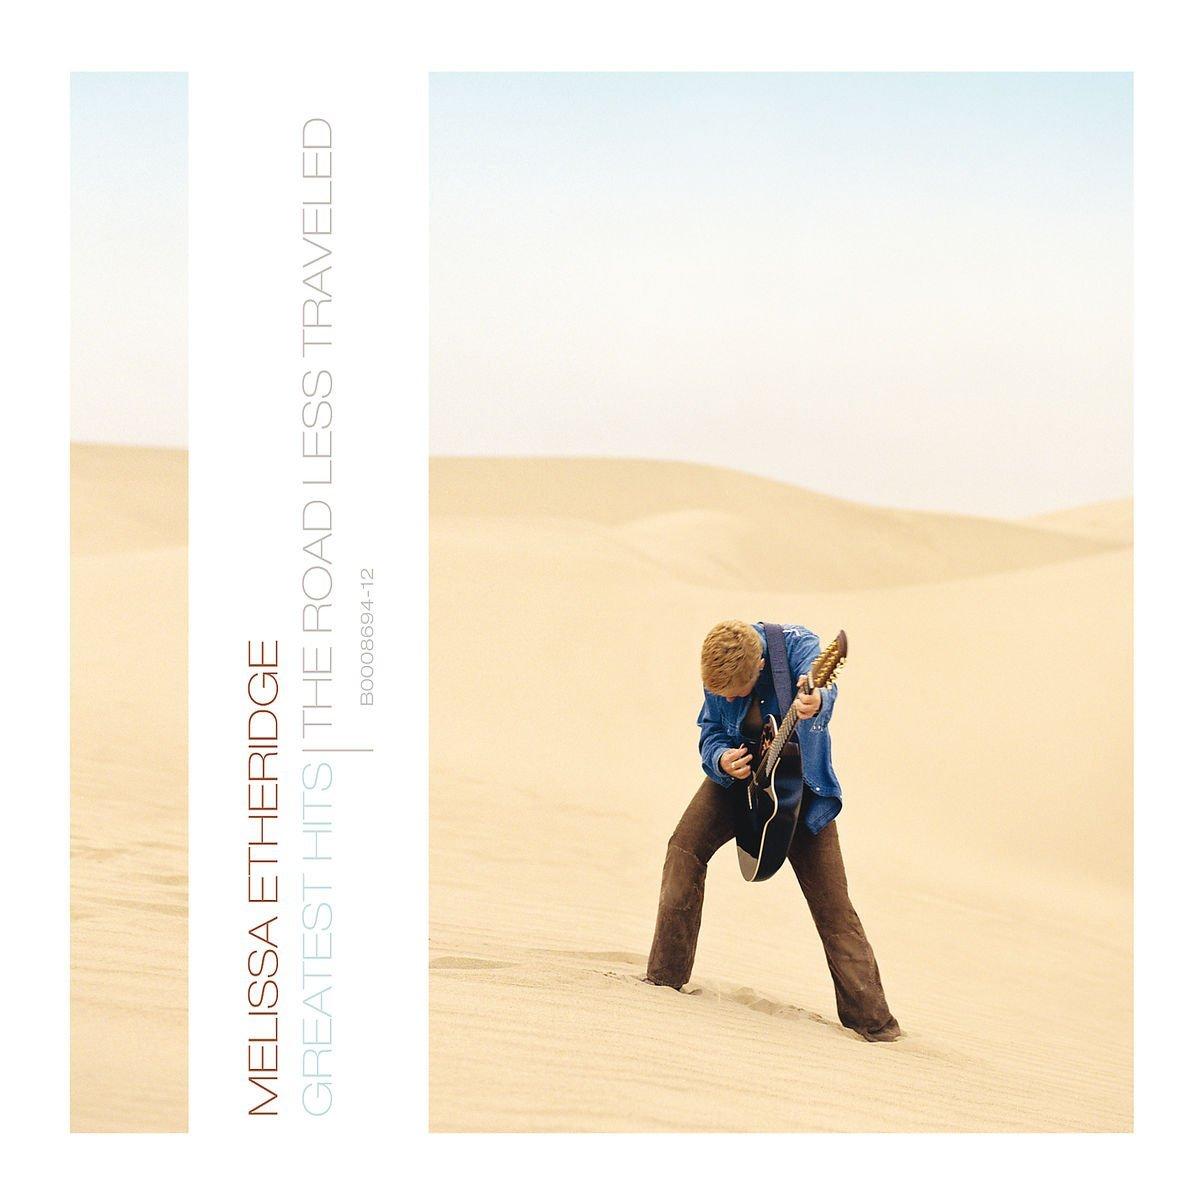 Melissa Etheridge, Greatest Hits: The Road Less Traveled